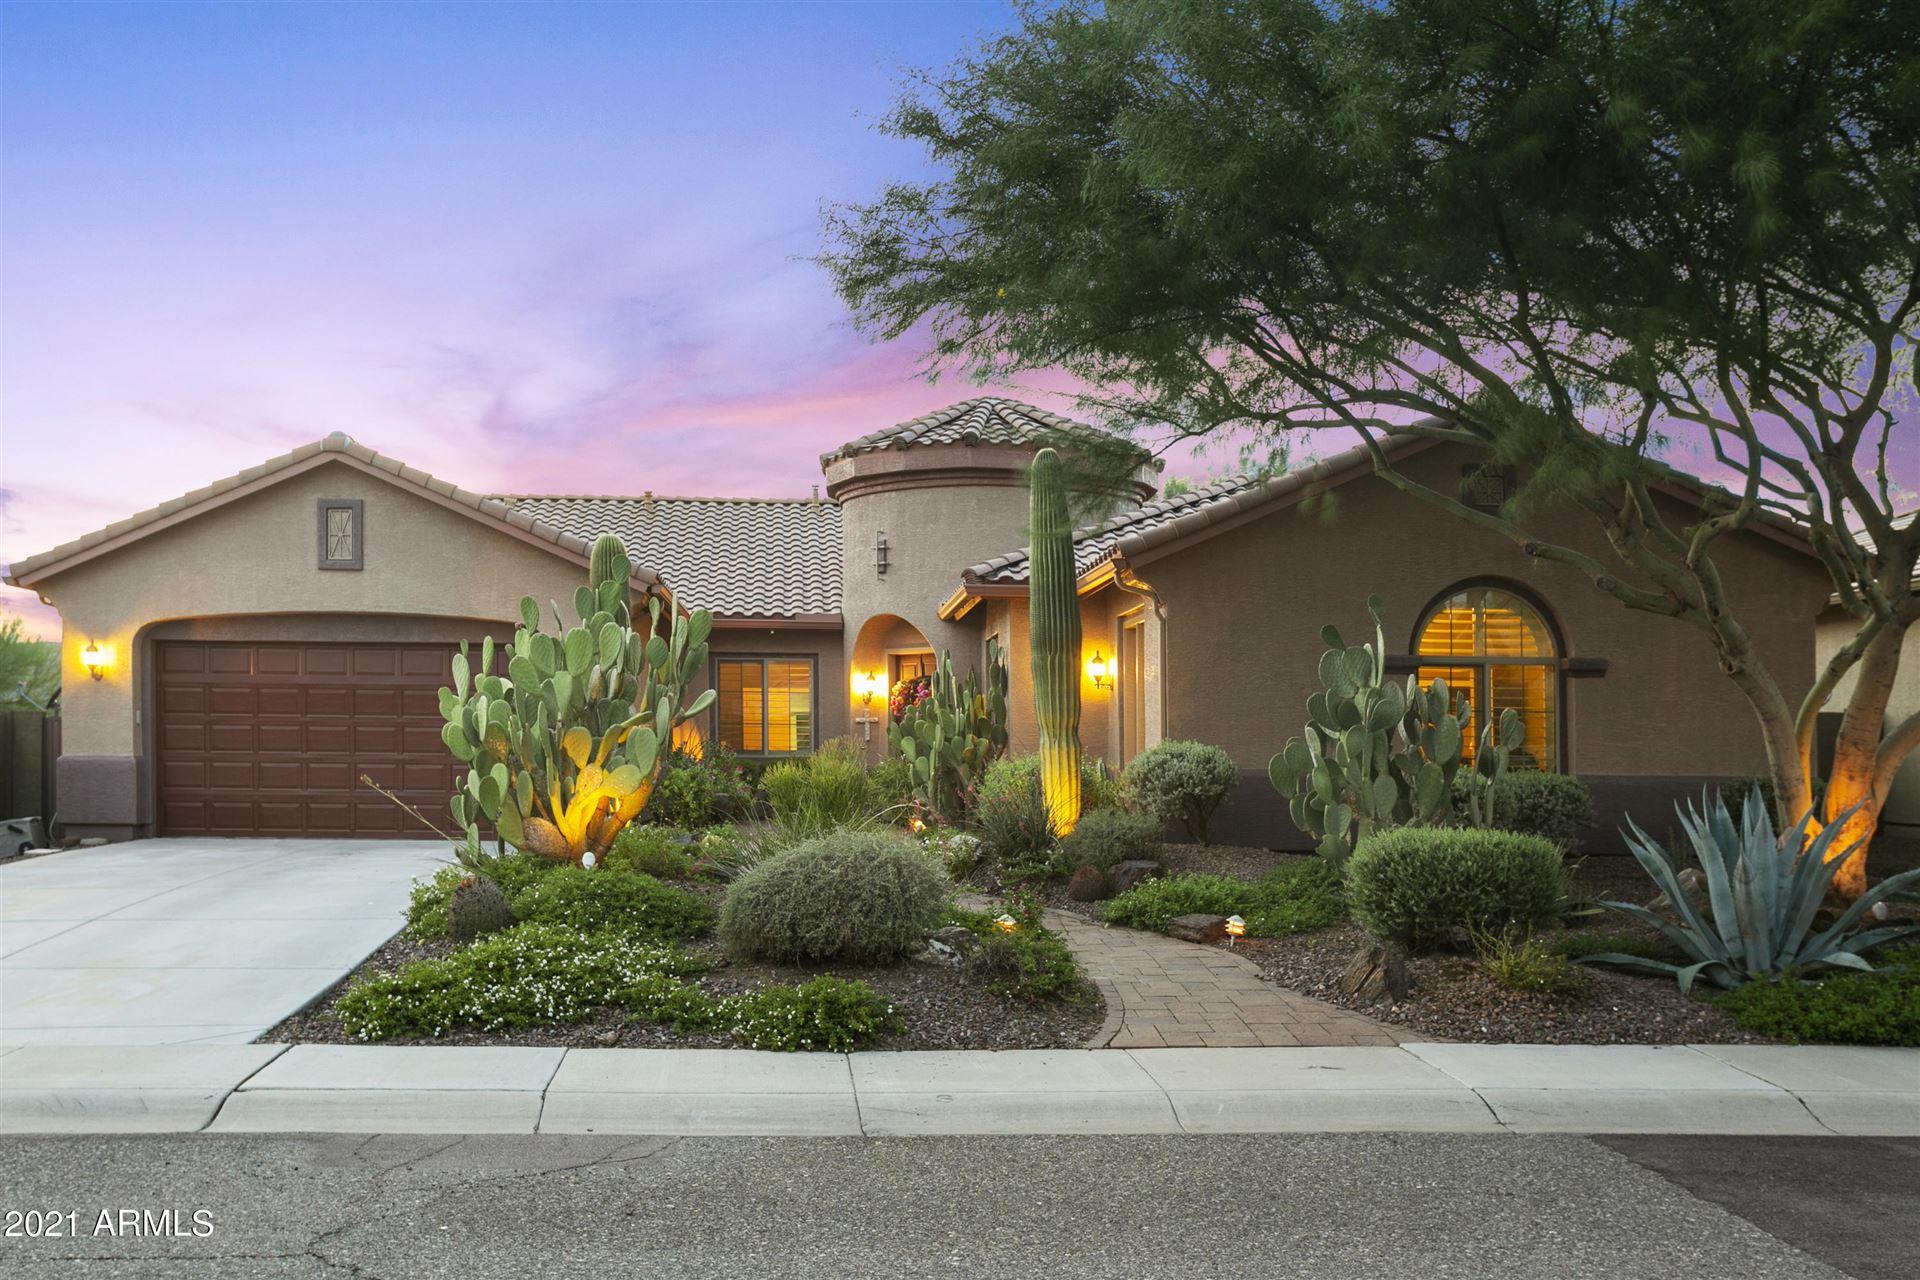 Photo of 43704 N 50TH Drive, New River, AZ 85087 (MLS # 6279314)